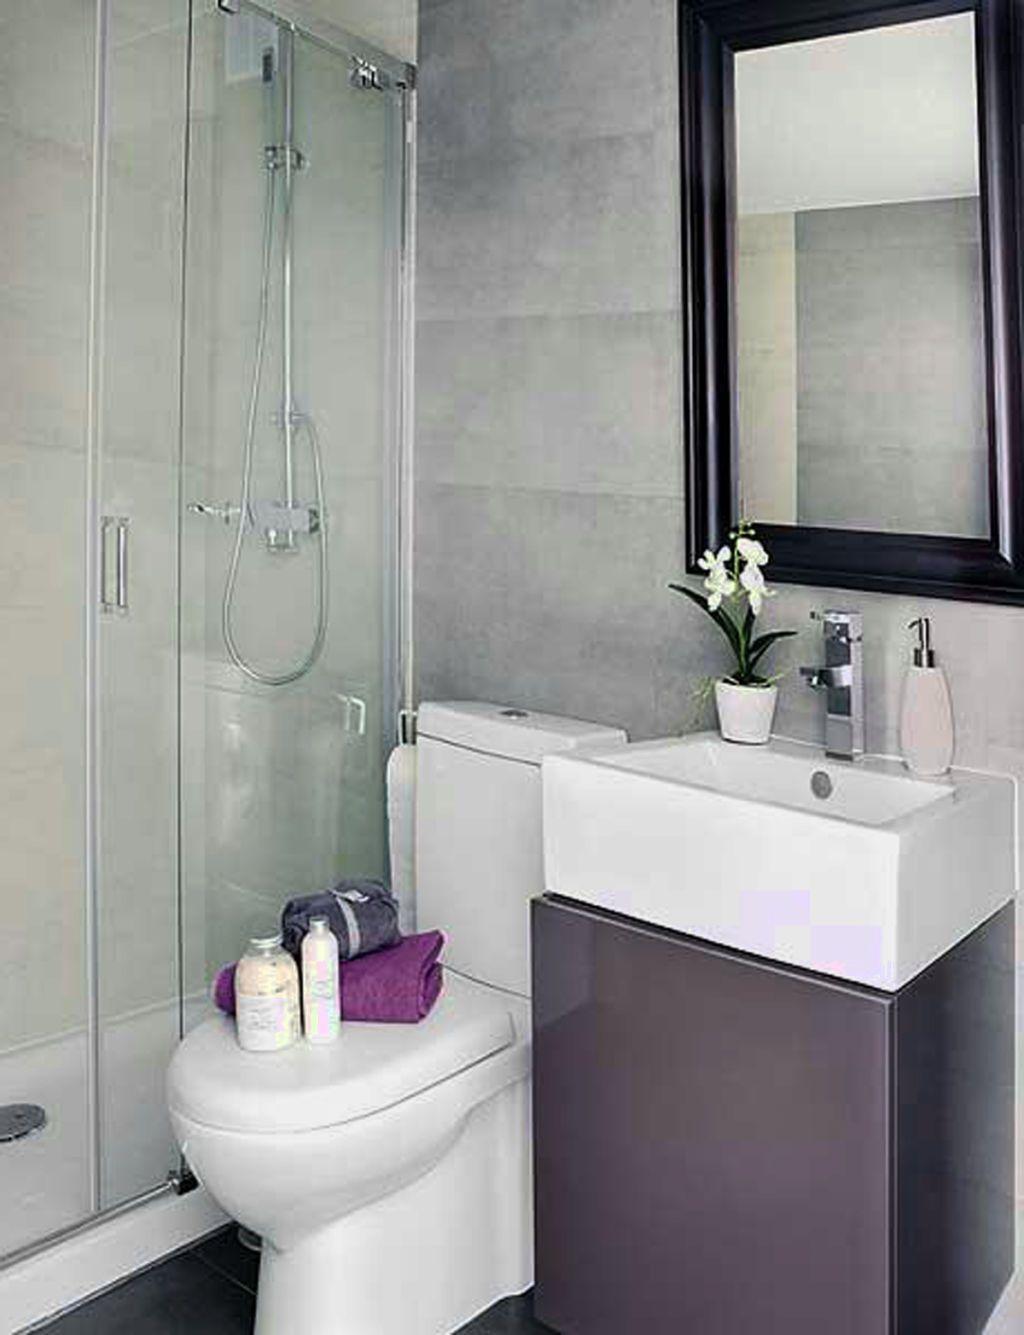 small bathrooms floor tiles best interior design bathroom on bathroom renovation ideas for small bathrooms id=69829